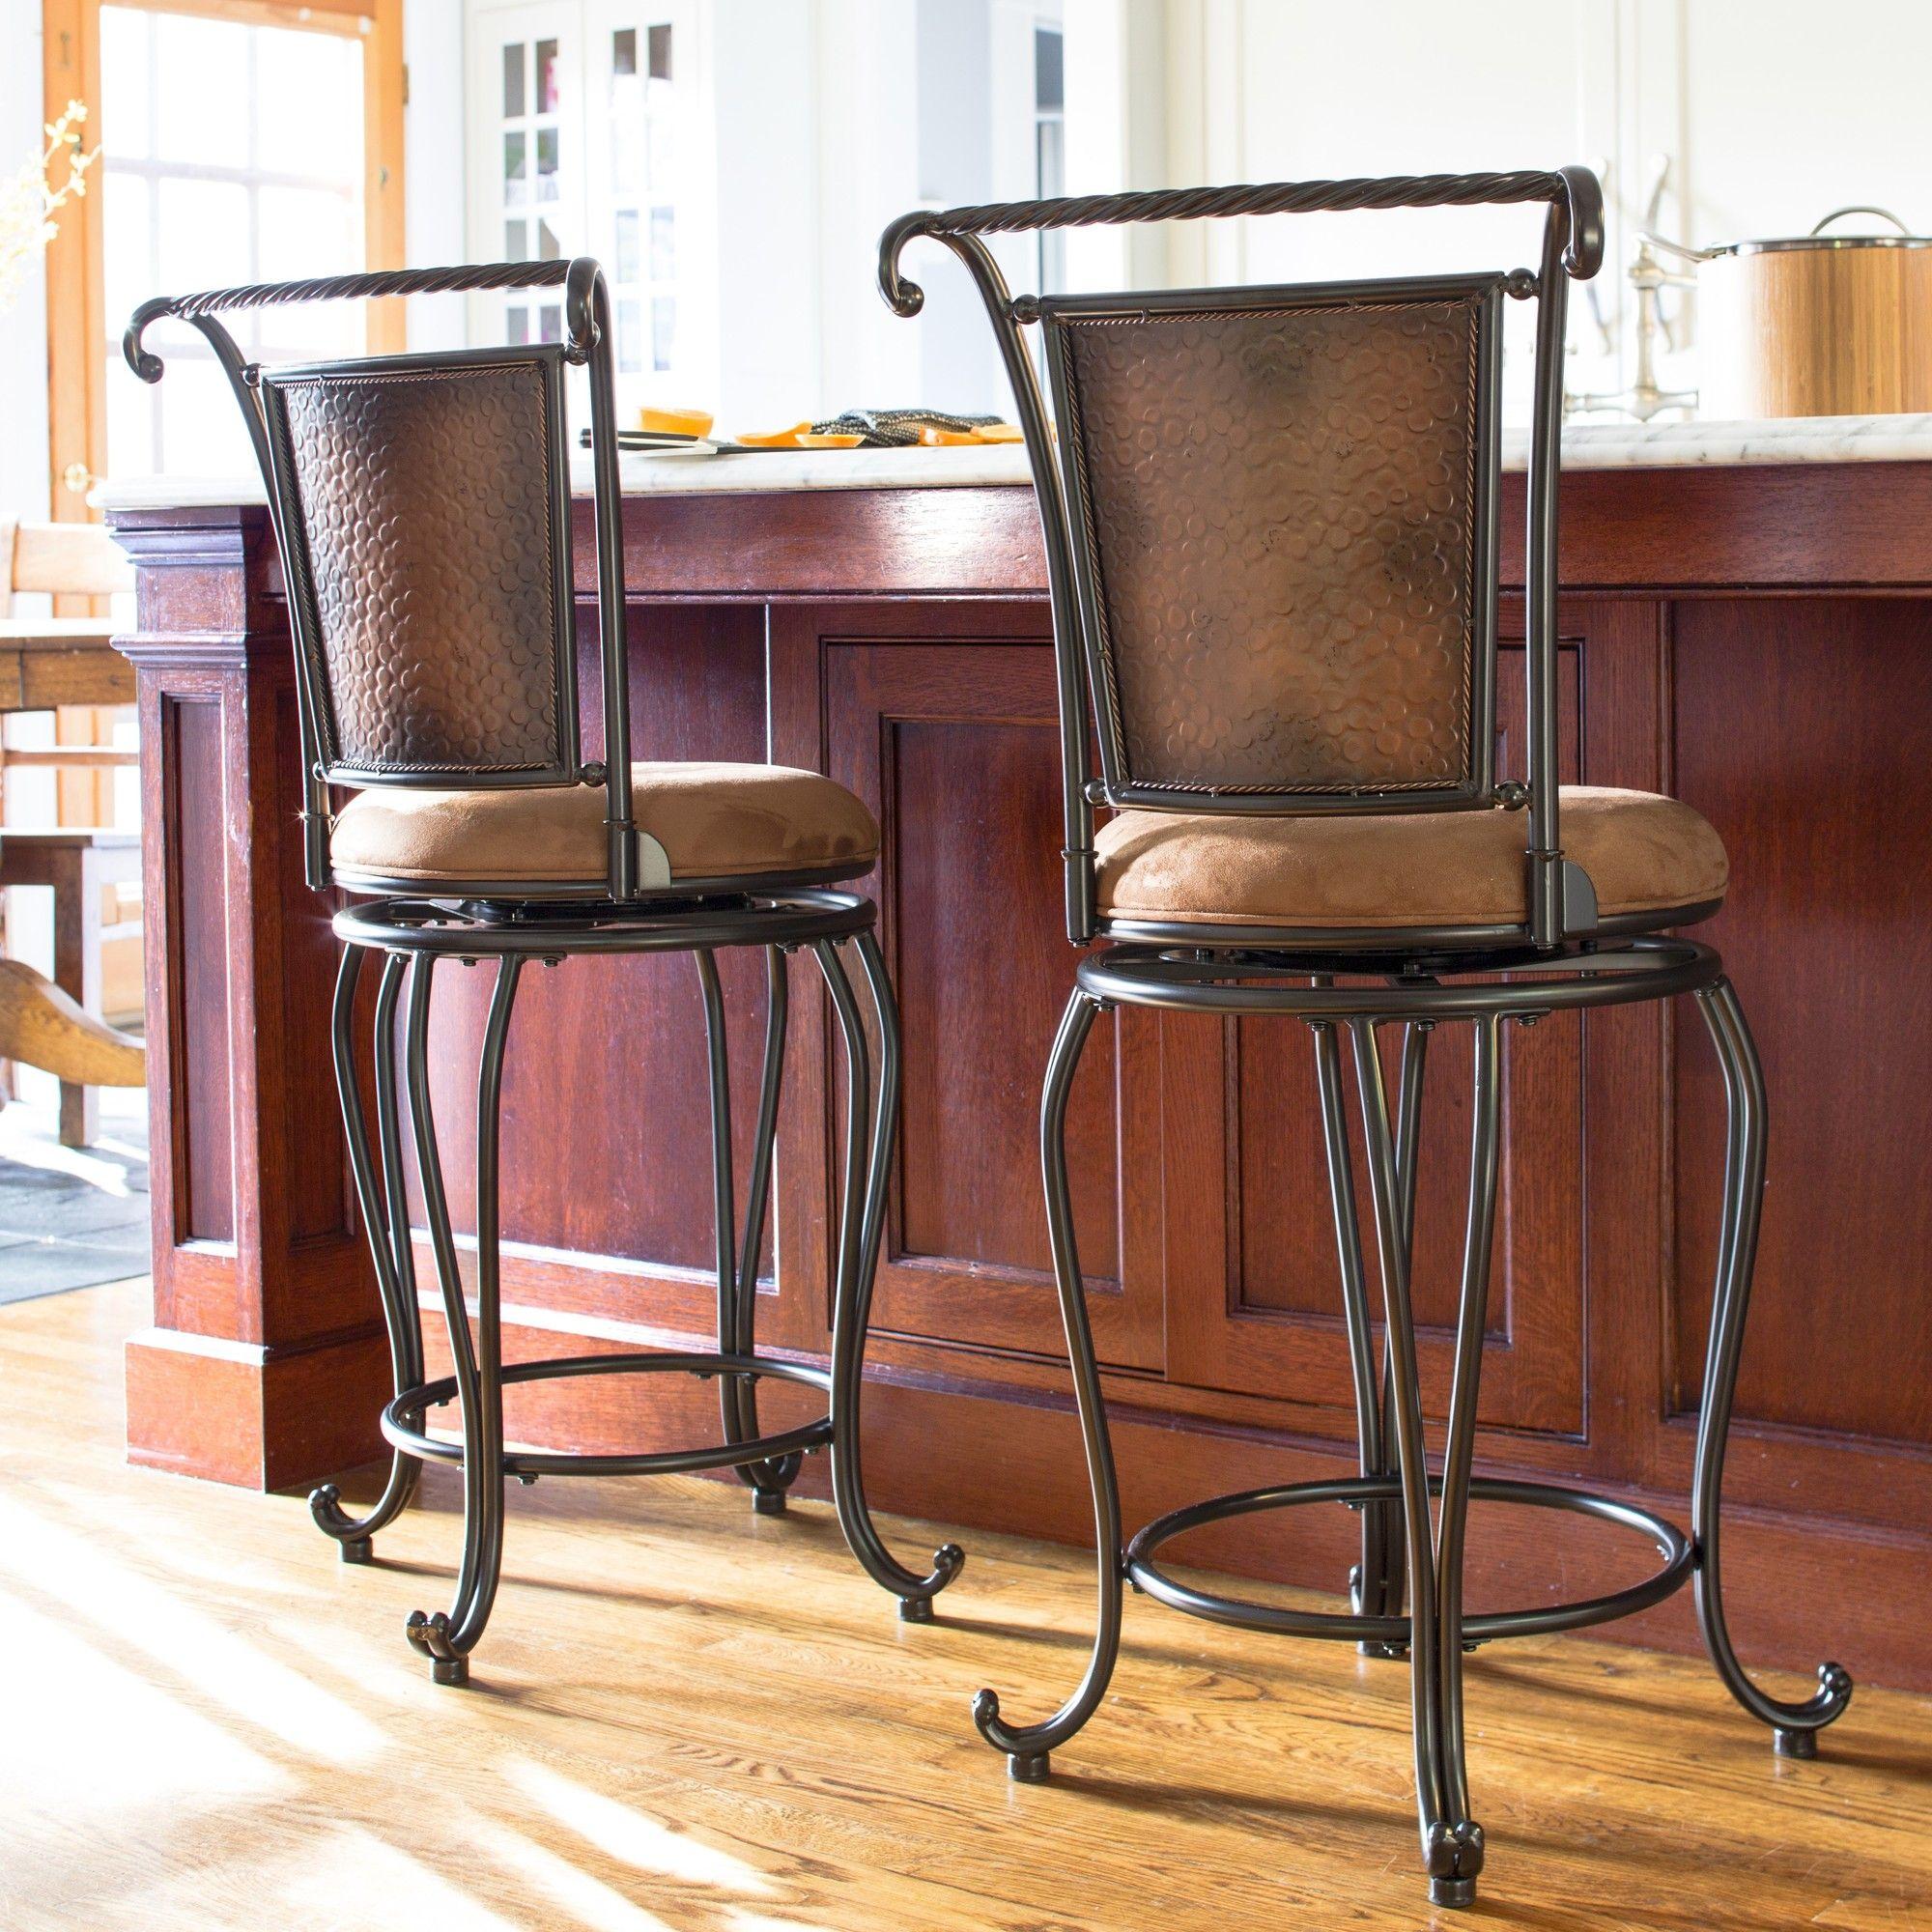 Swival Bar Stools Swivel bar stools, Bar stools, Bar